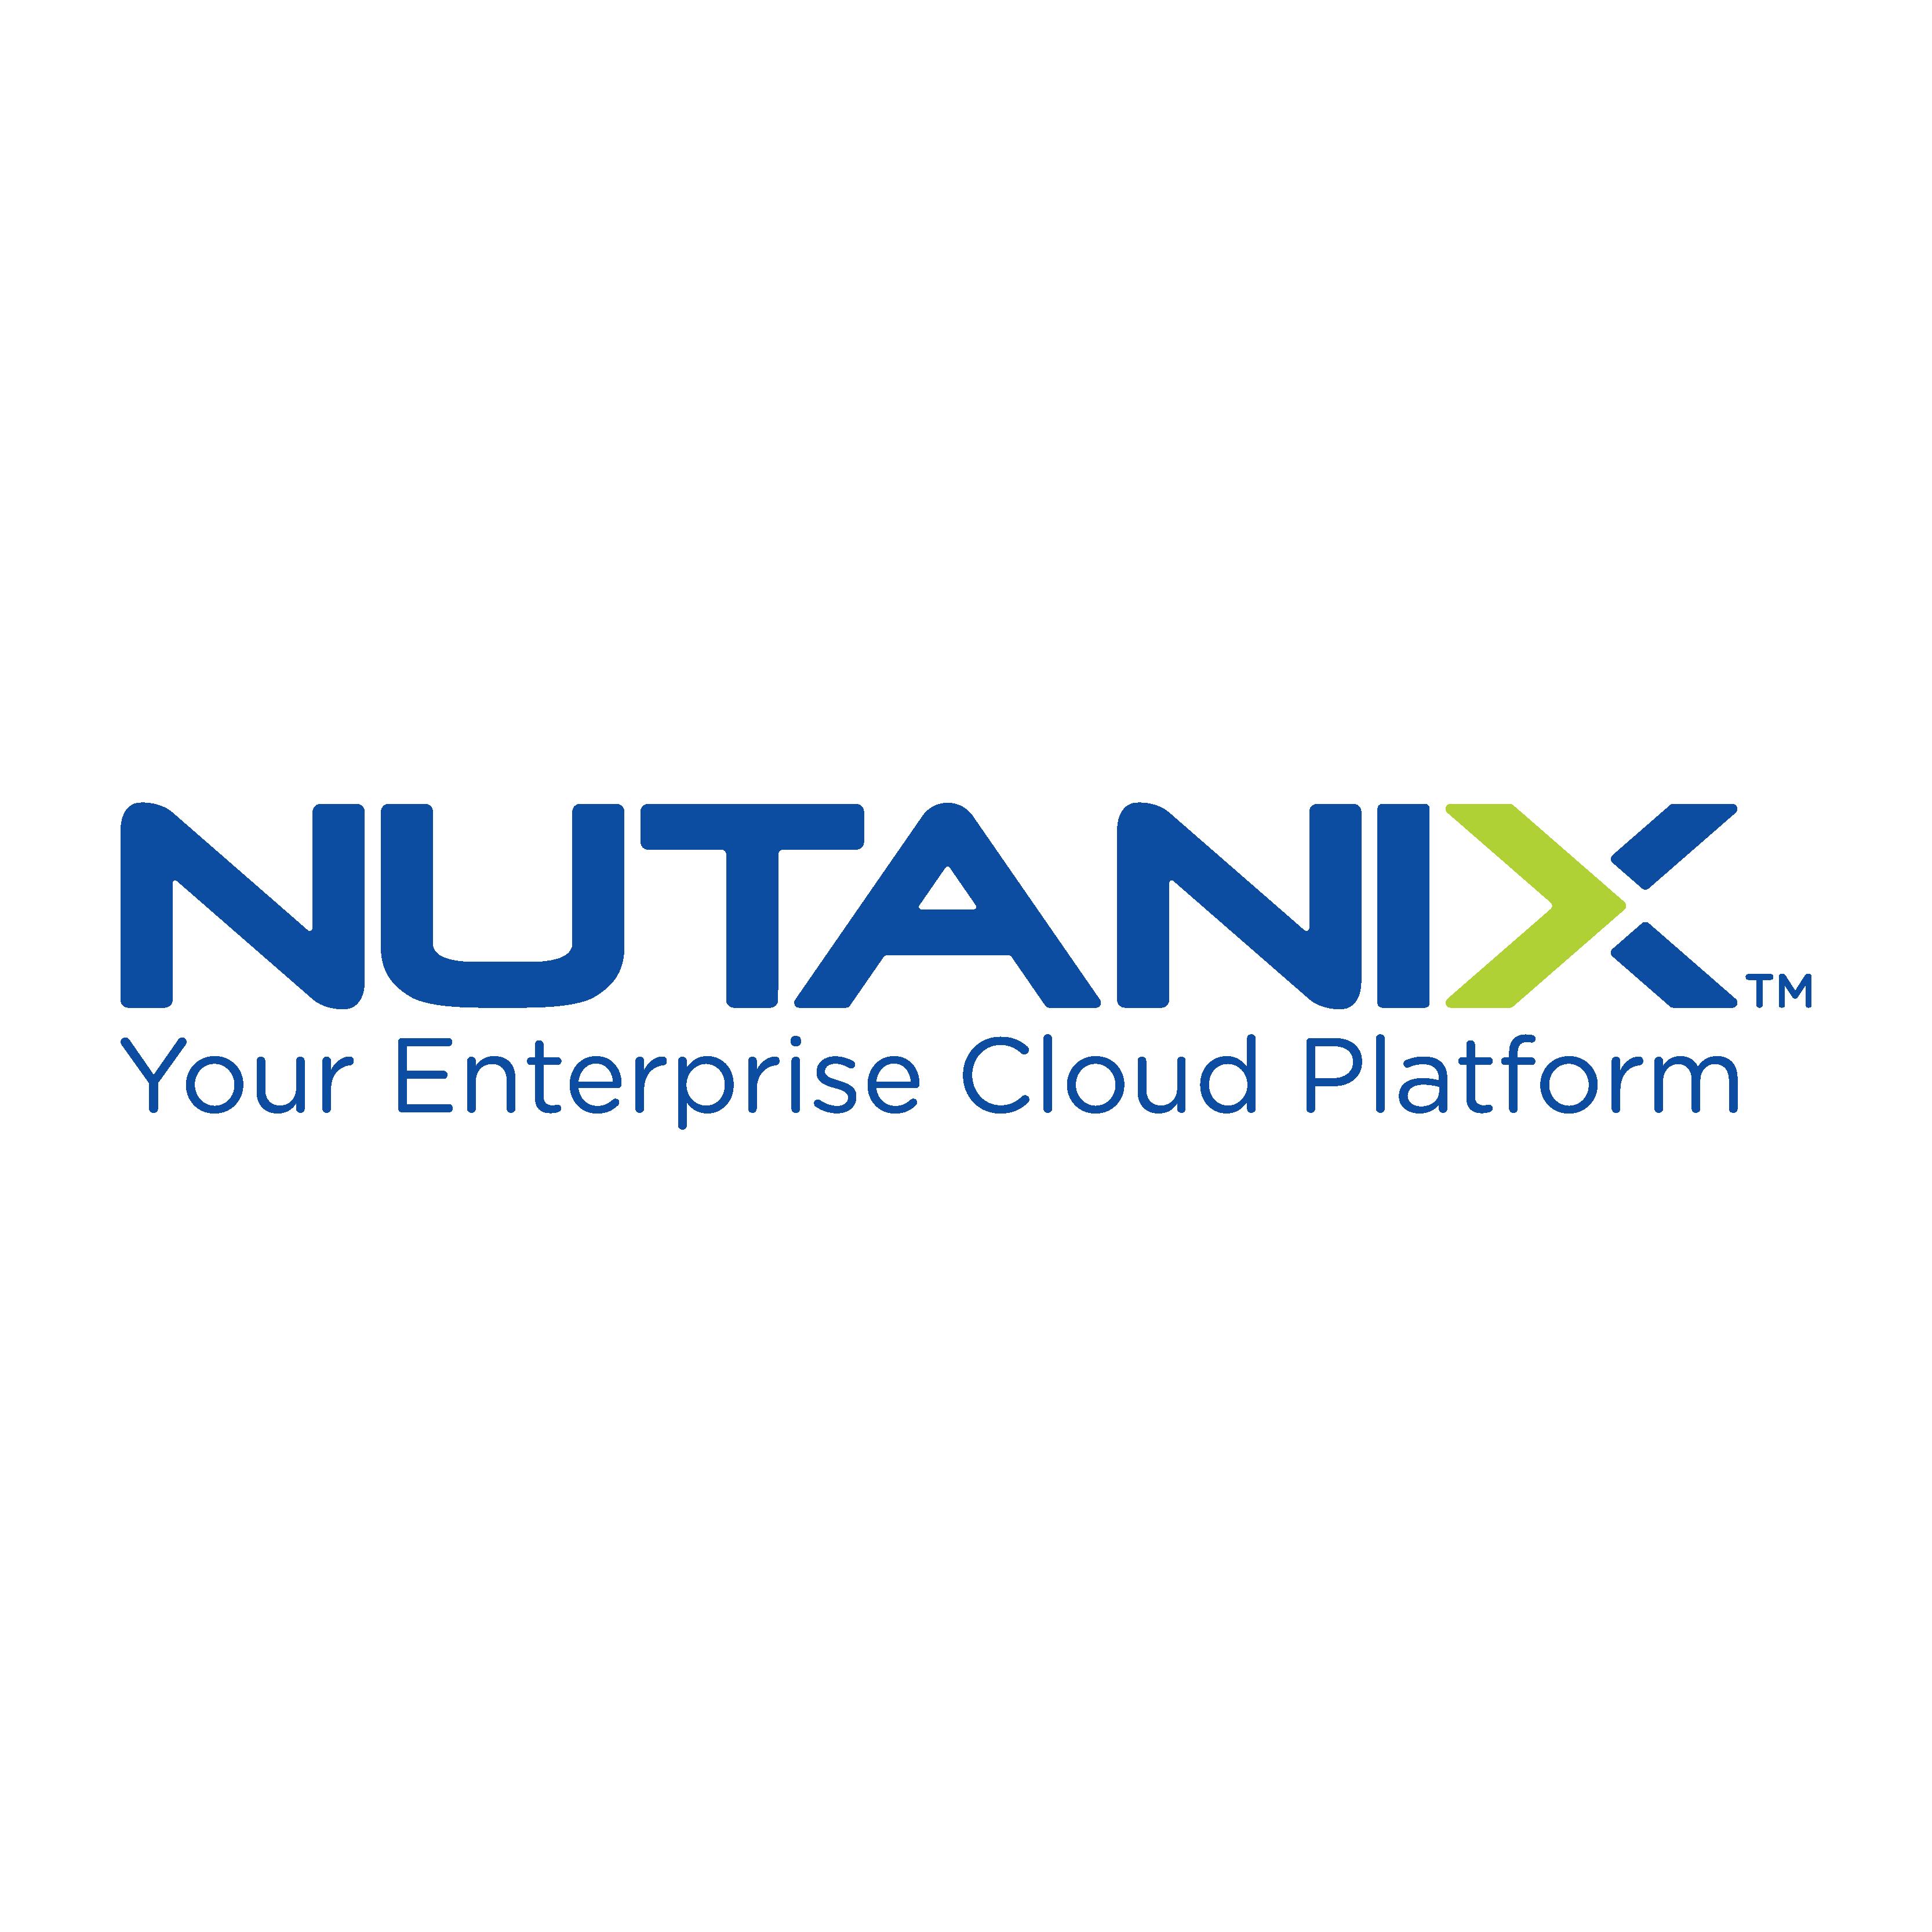 Nutanix ECPA5 Training